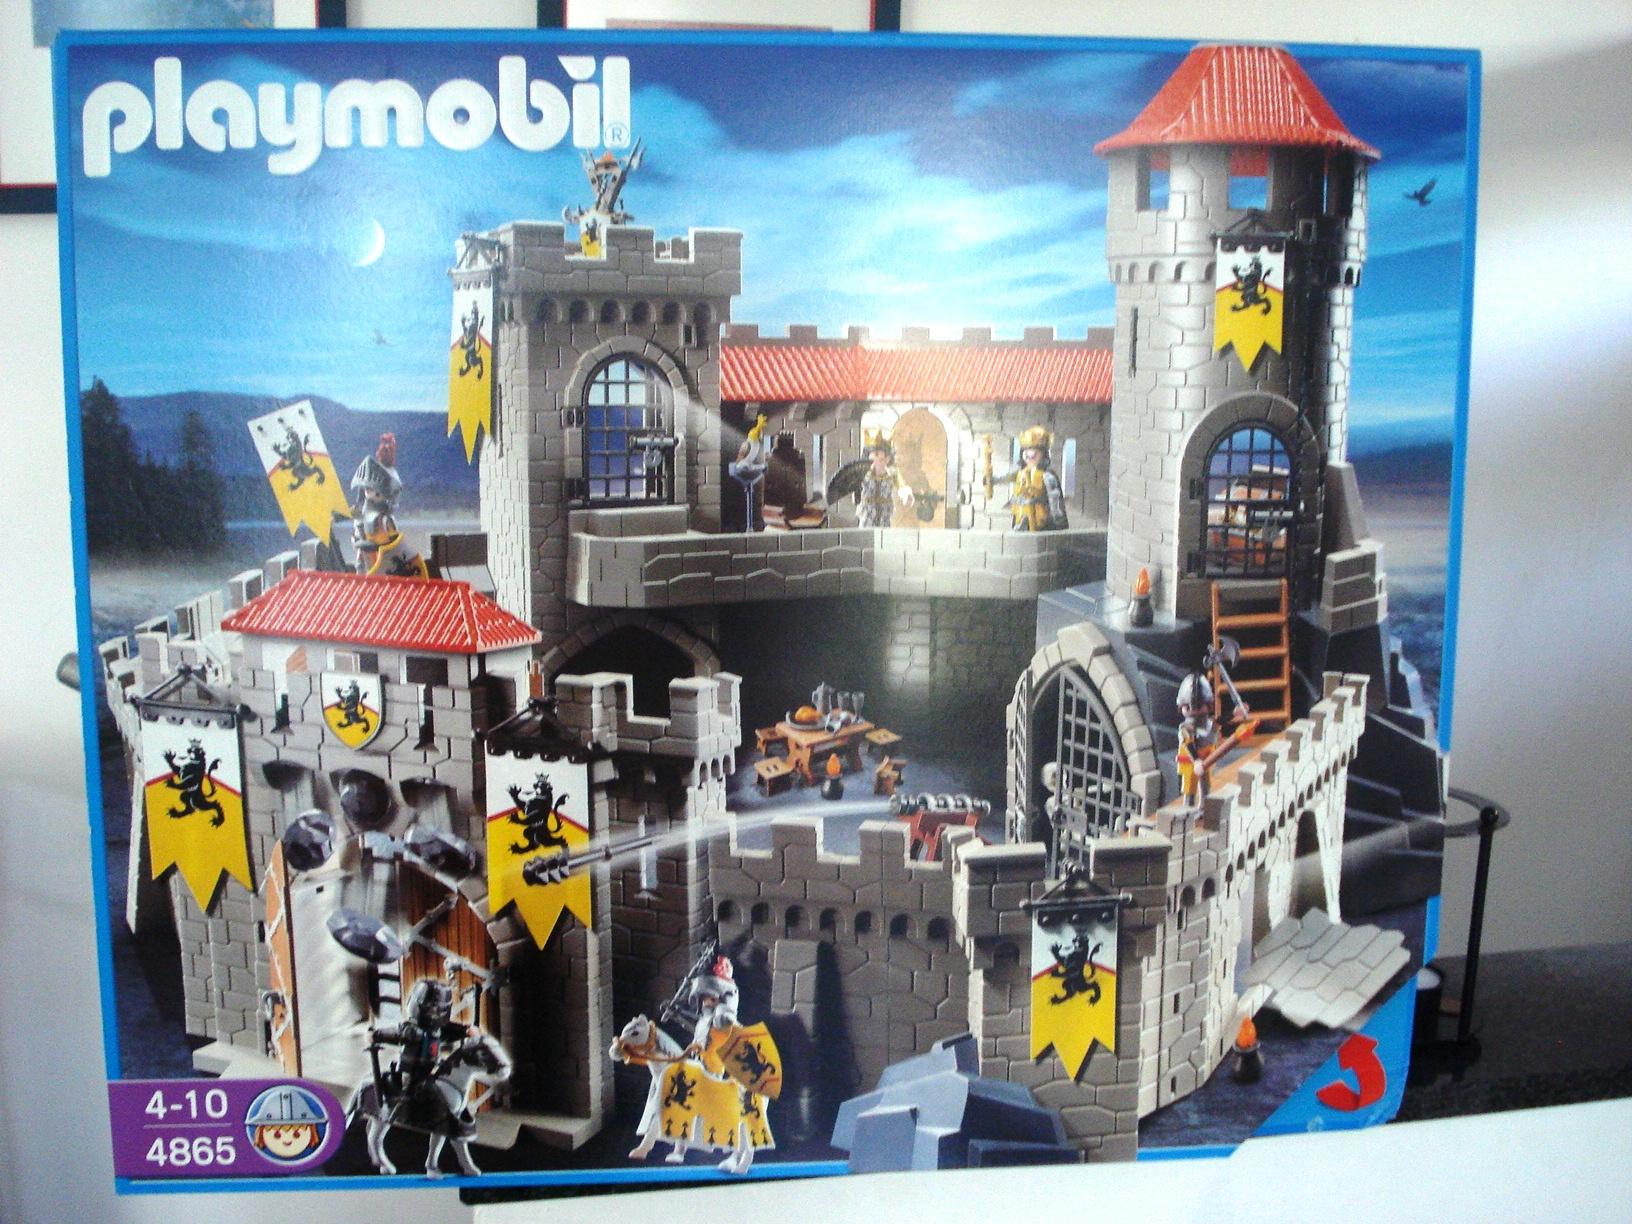 Playmobil 4865 grosse l wenritterburg neu ovp ebay for Playmobil 4865 prix